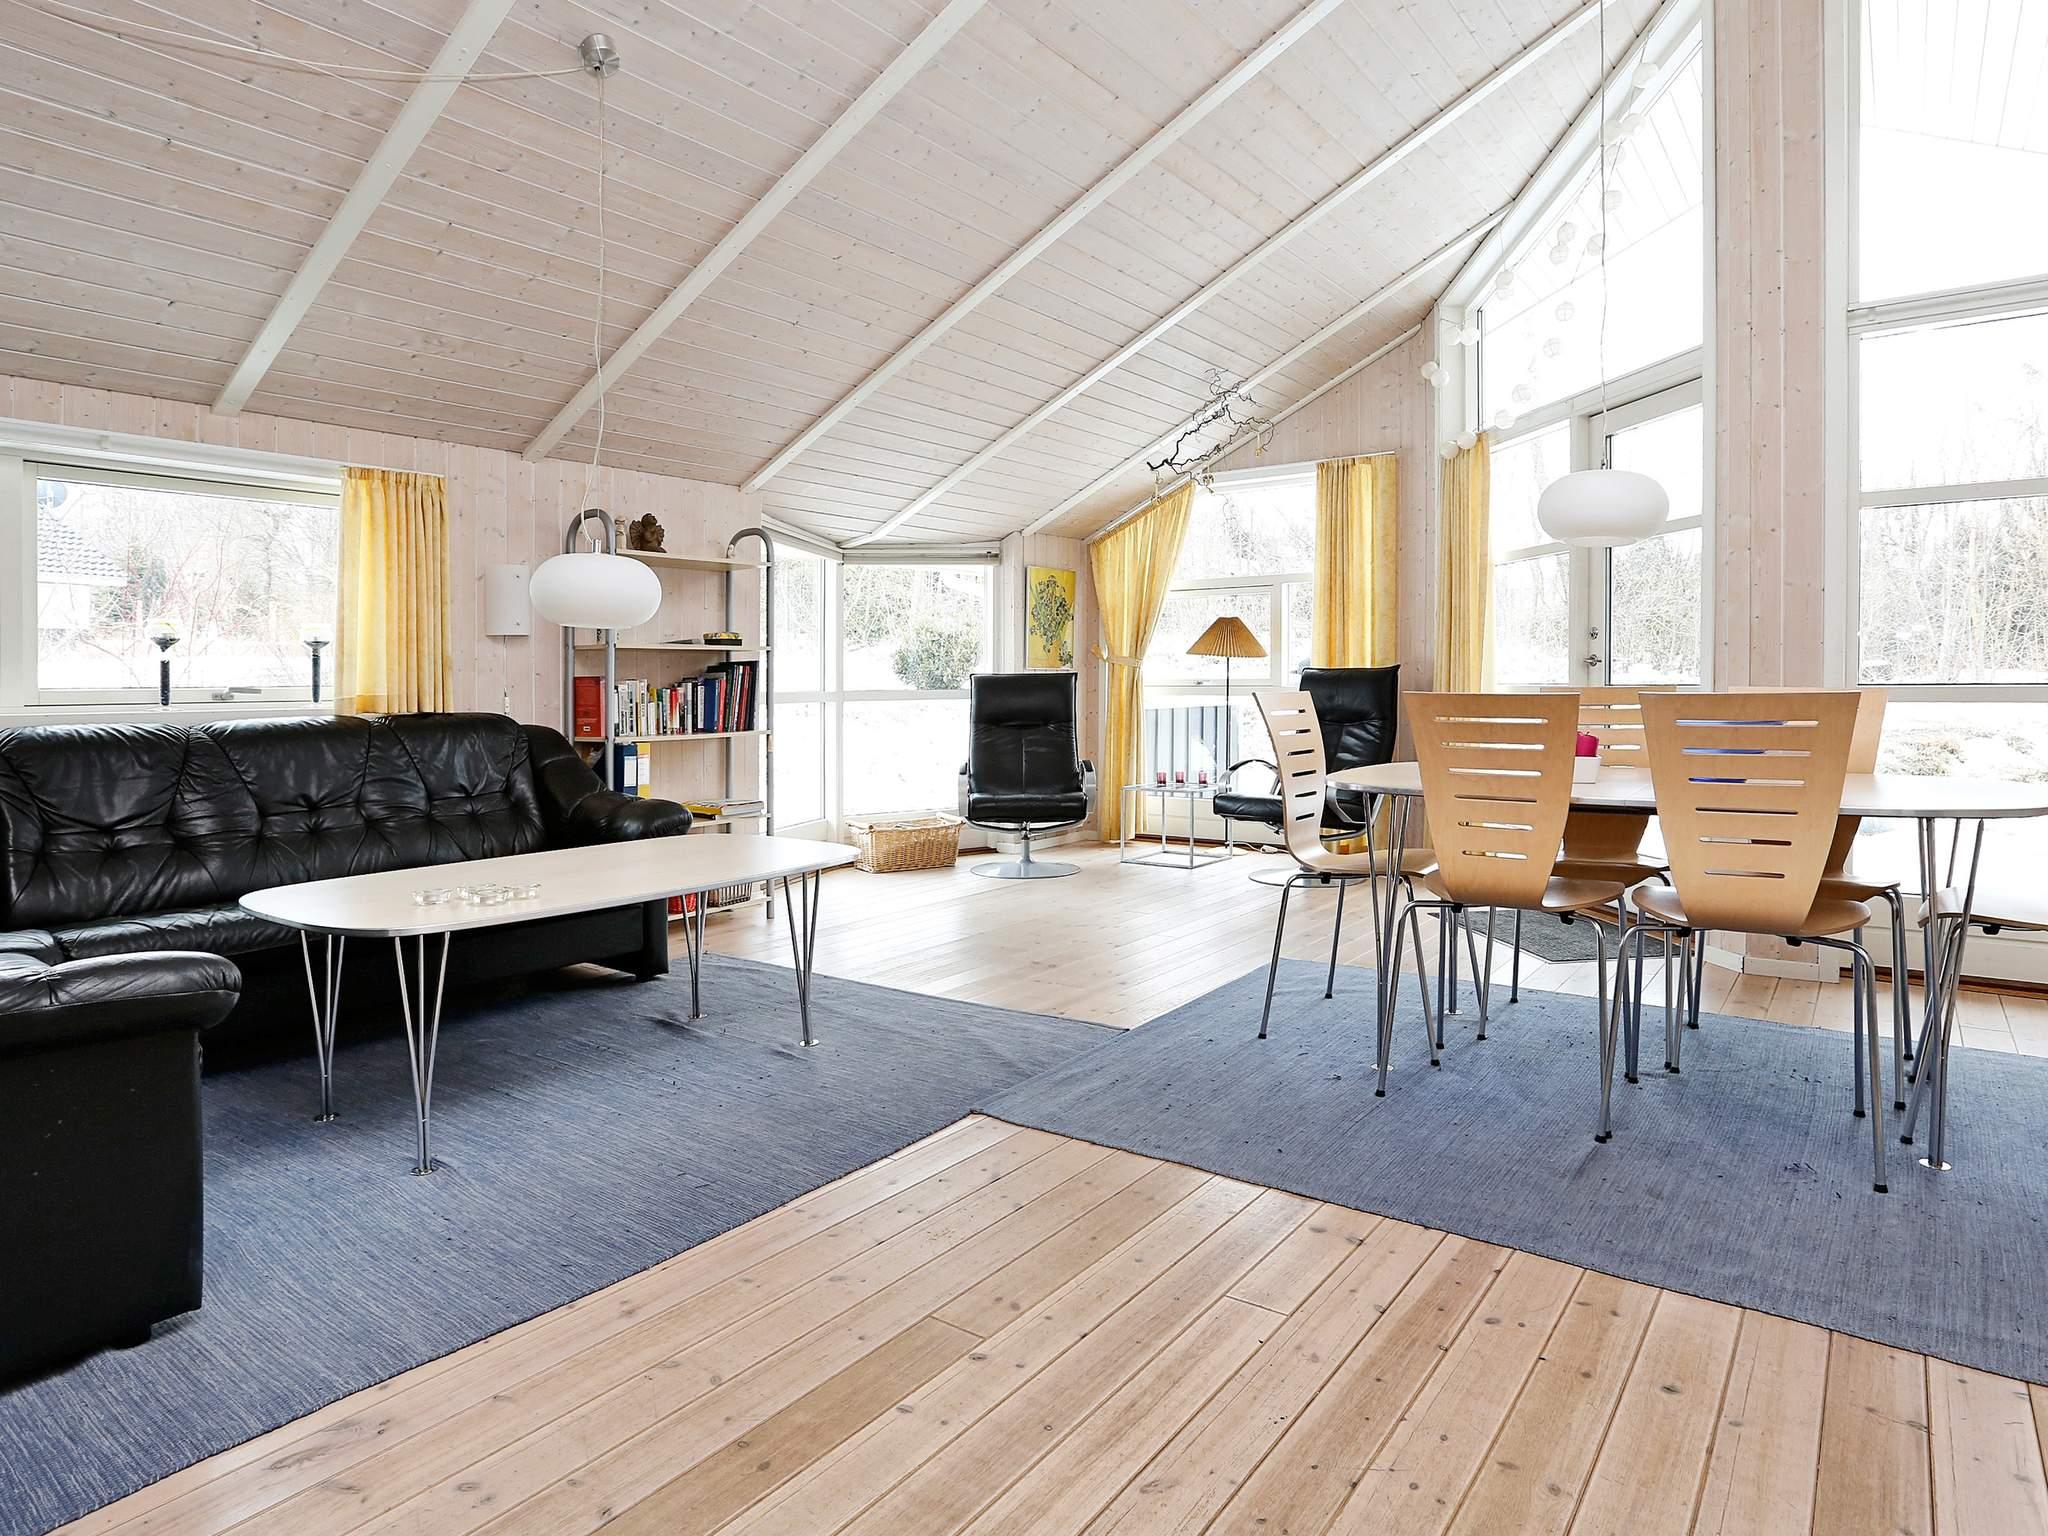 Ferienhaus Smidstrup Strand (86601), Smidstrup, , Nordseeland, Dänemark, Bild 3